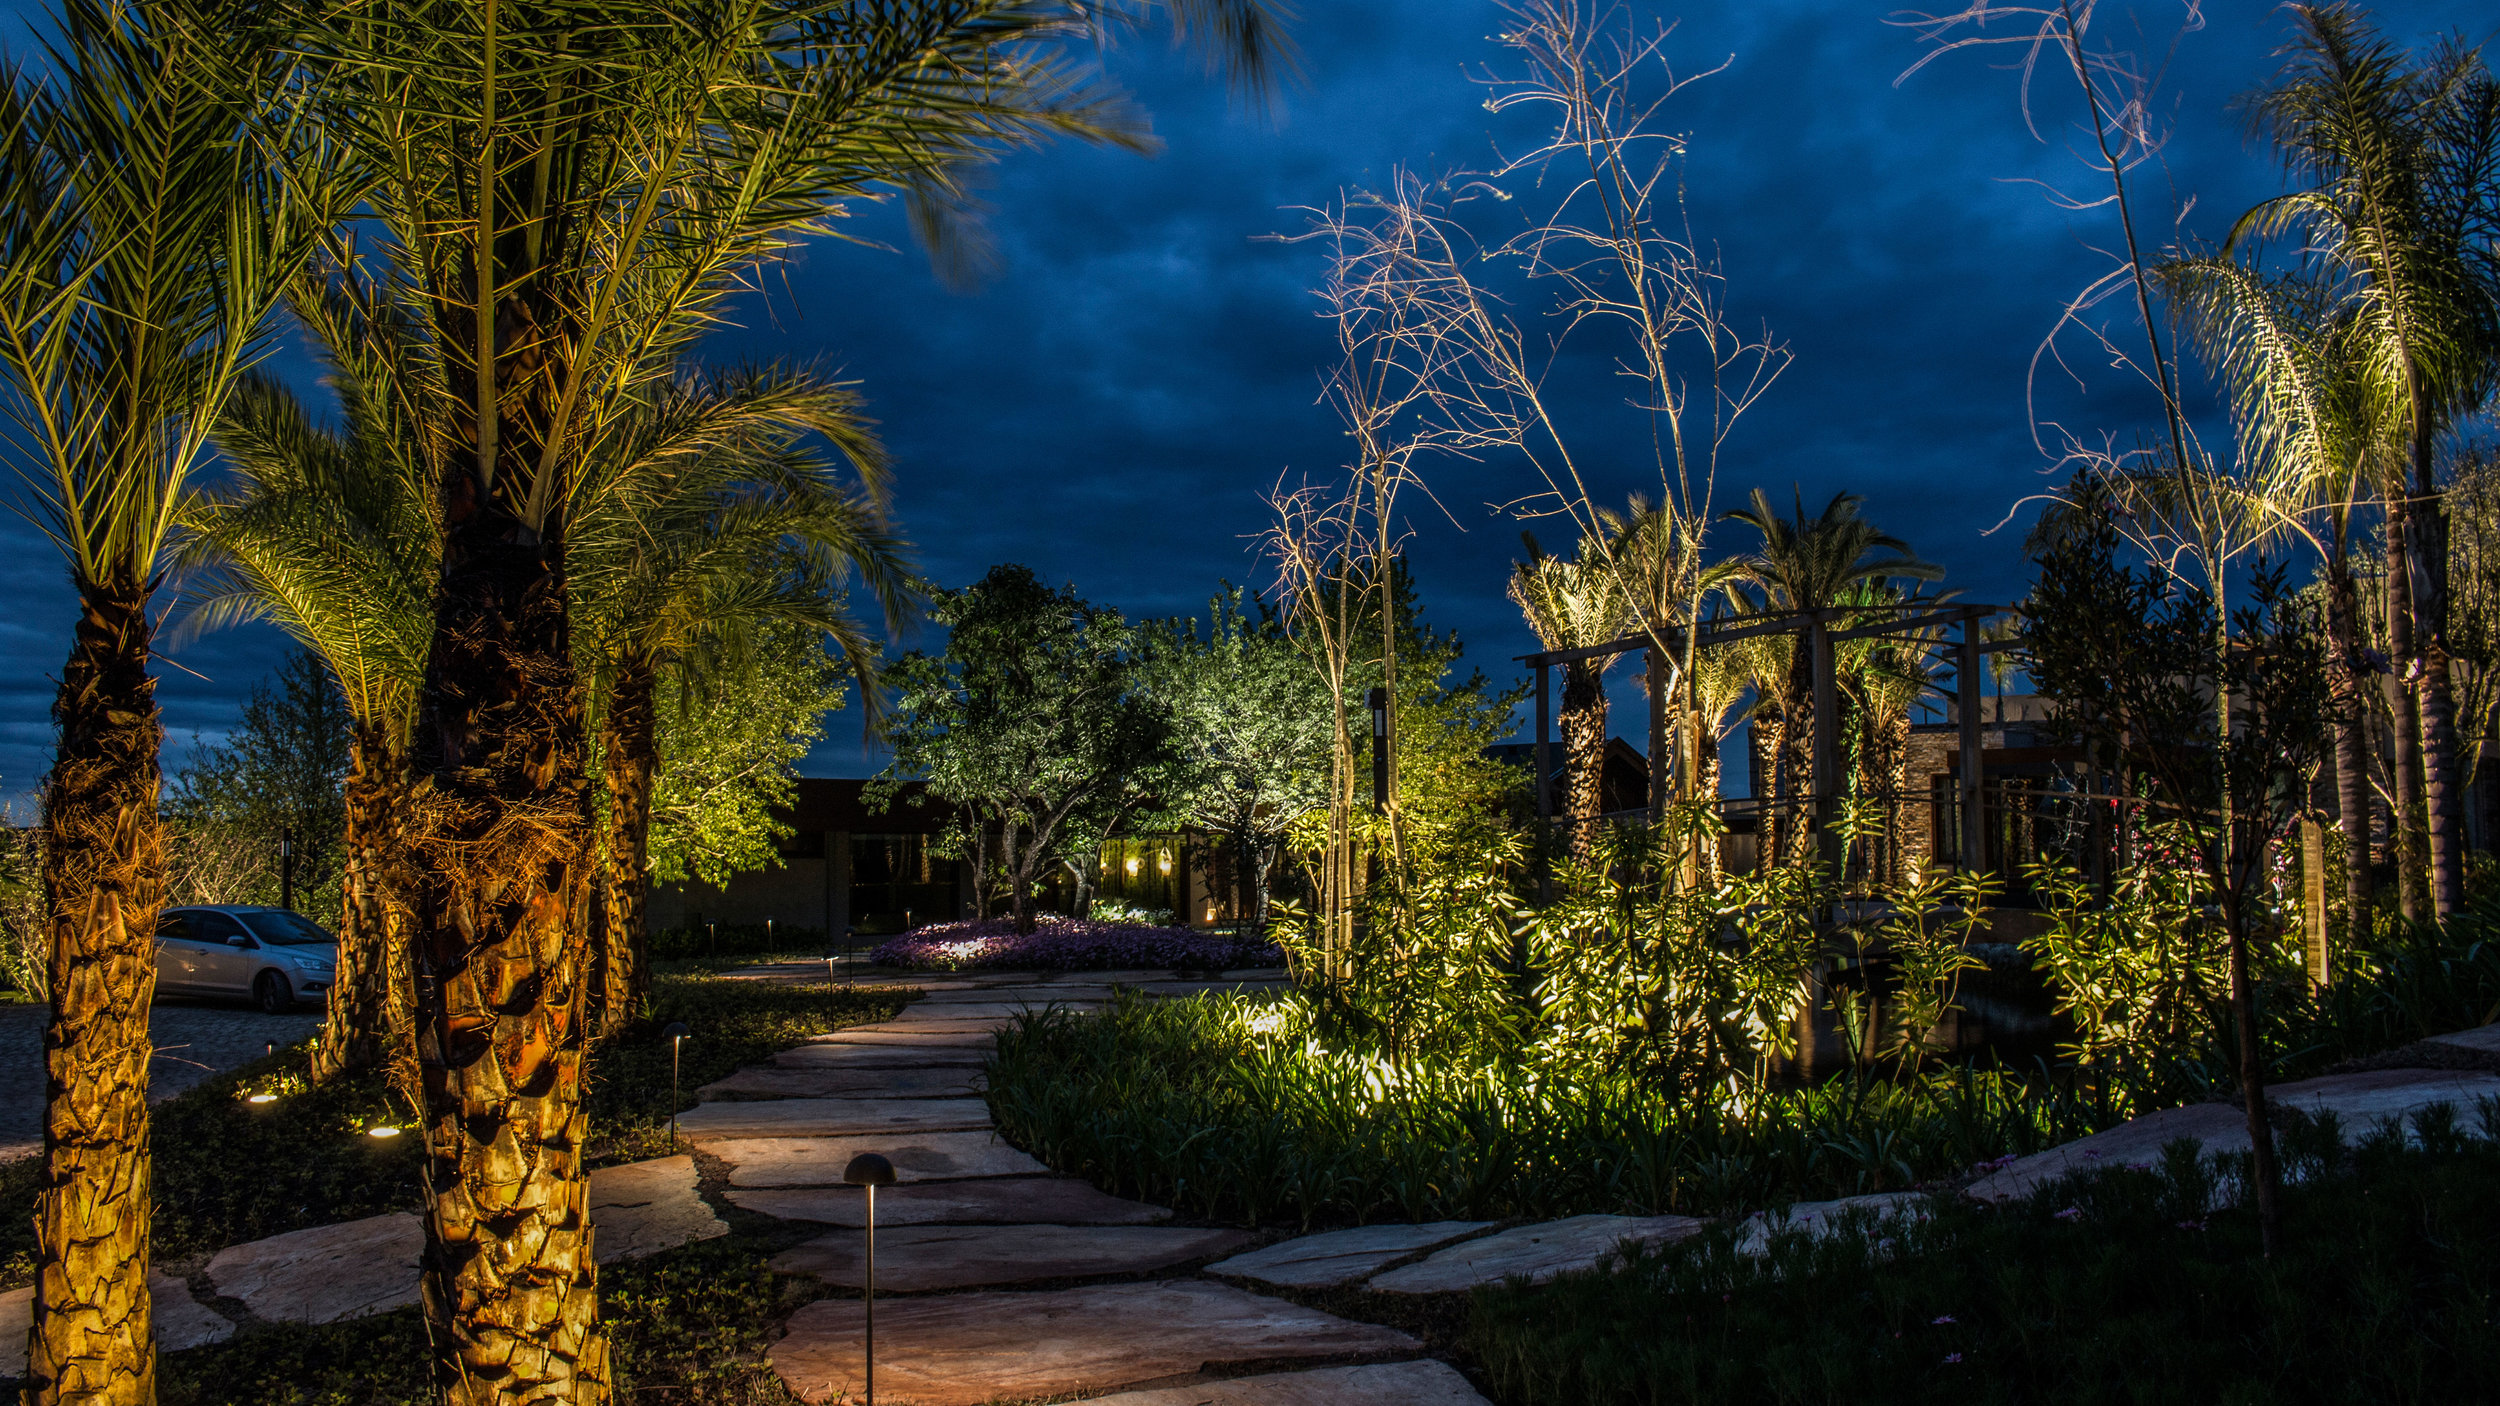 LIGHTSOURCE_Residencia-Campos-do-Jordao _ LC-Orsini_Abbud-Aguiar_004.jpg